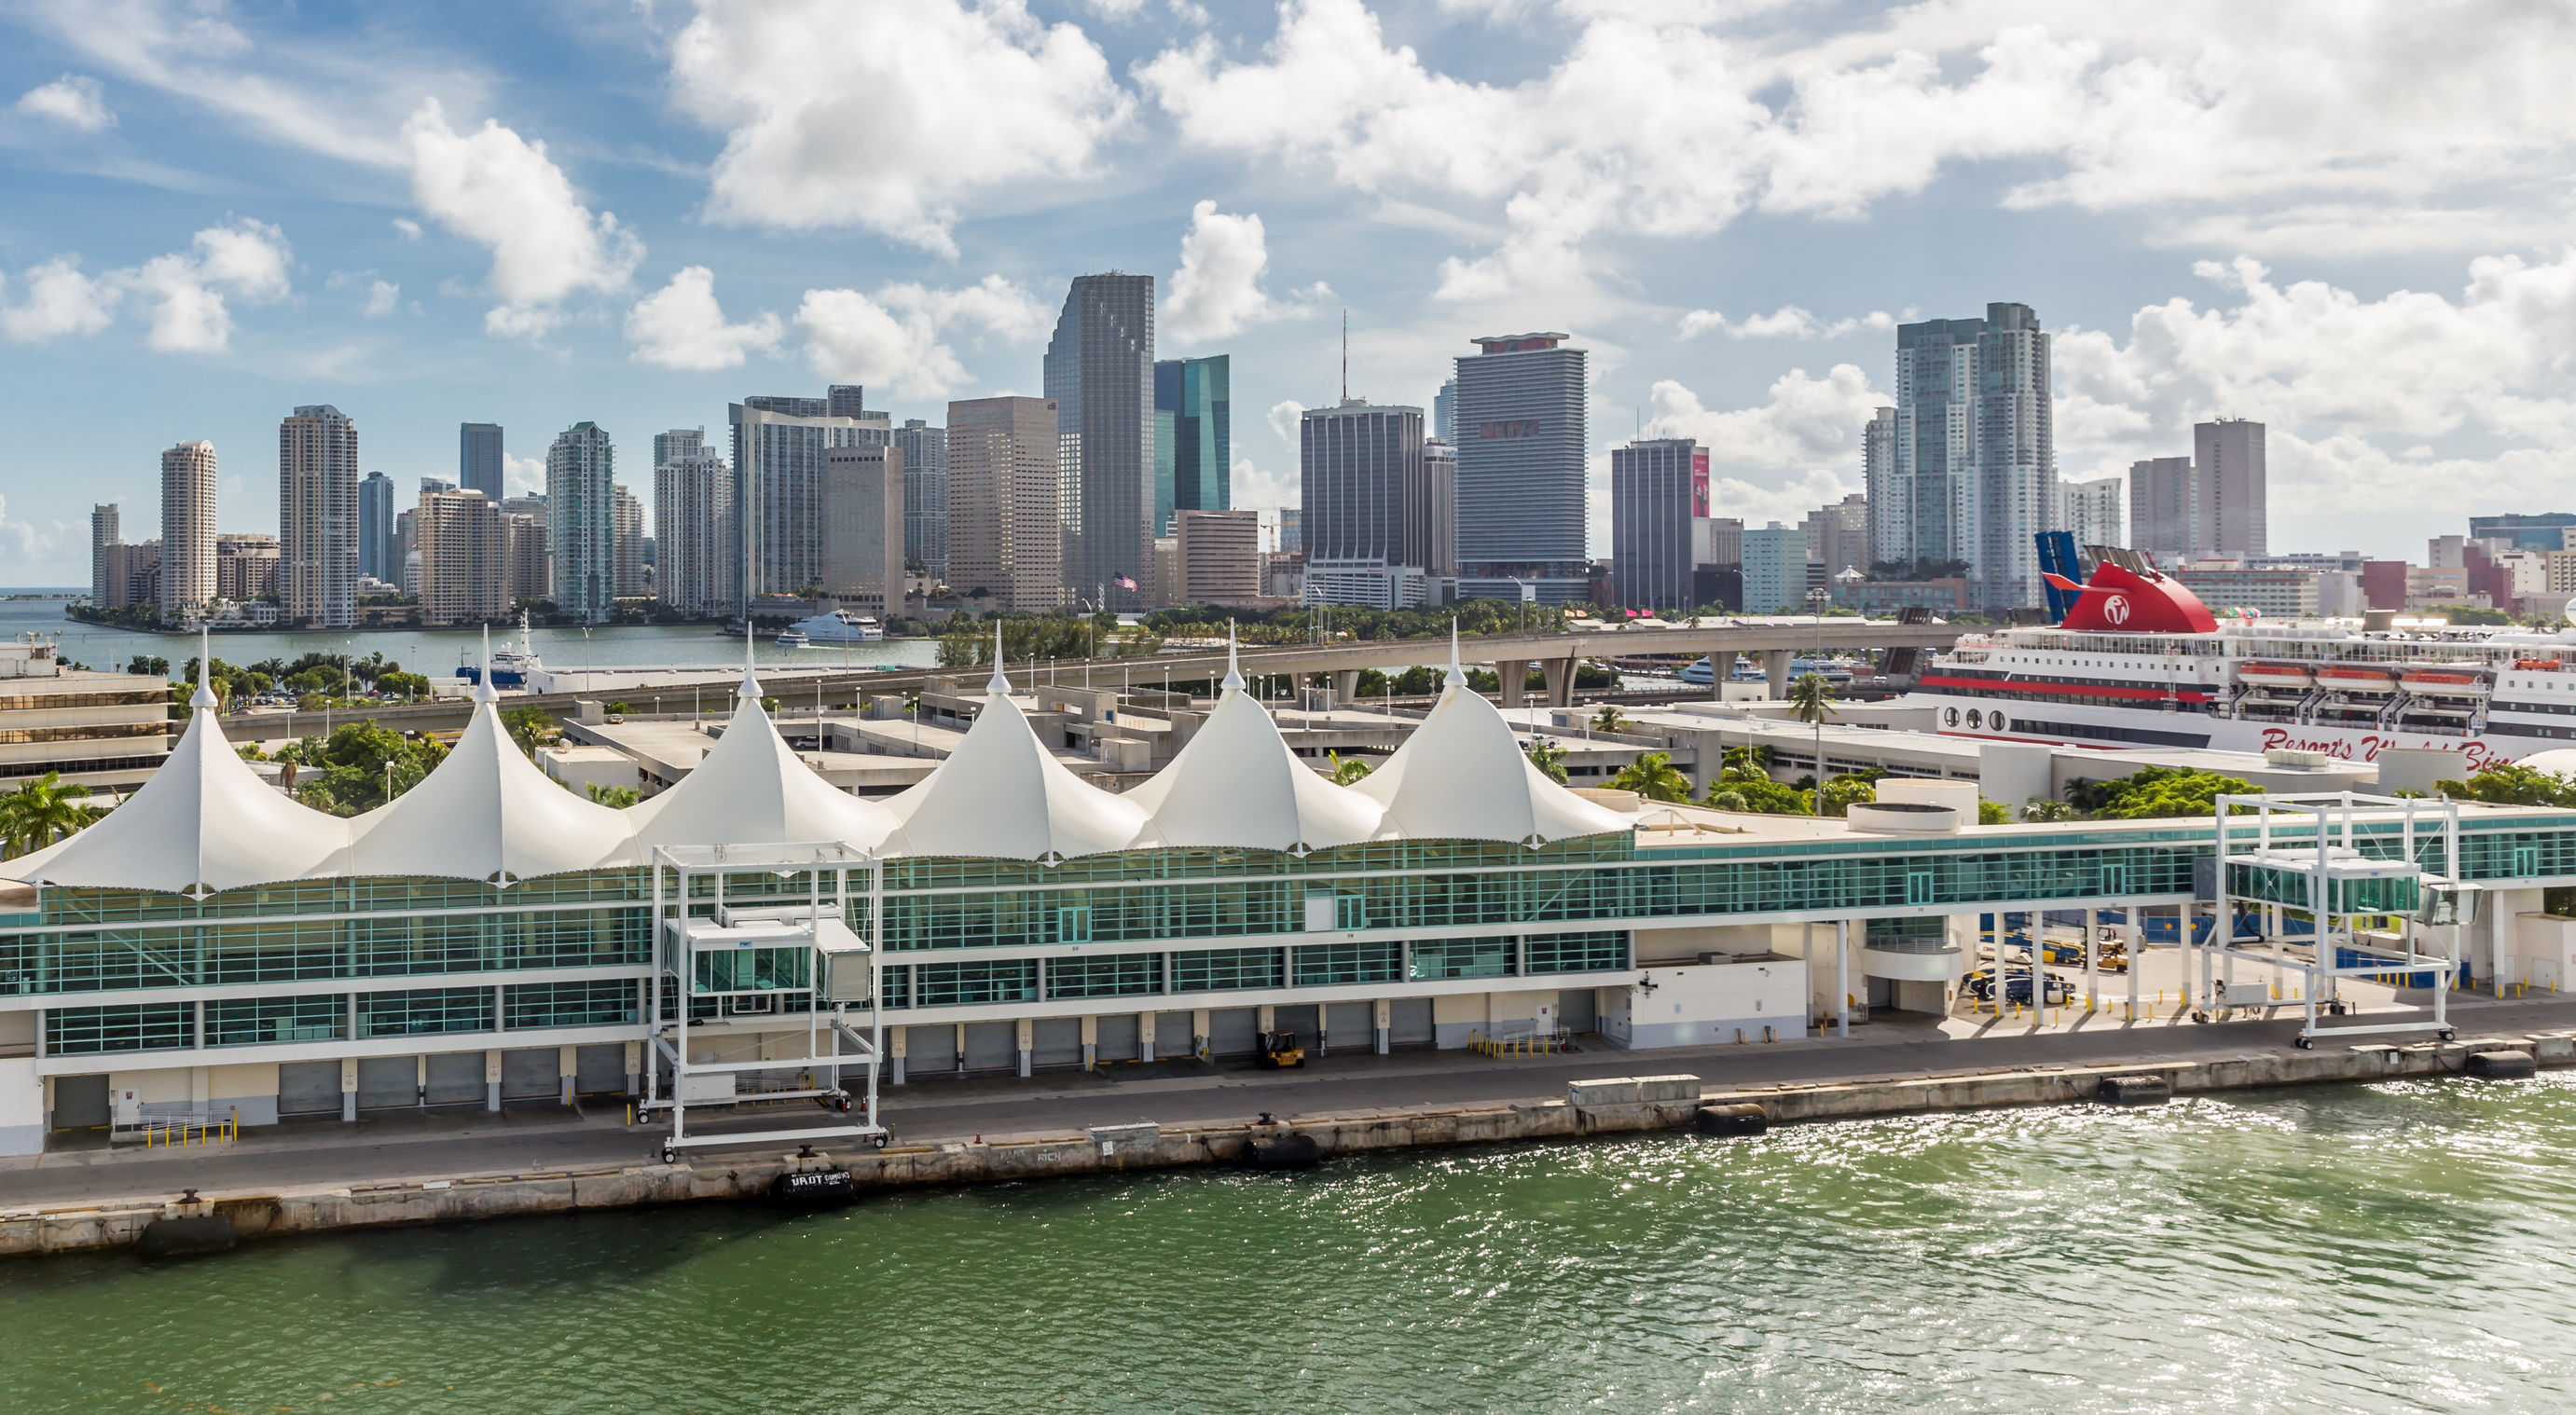 Miami Cruise Ship Injury Lawyer